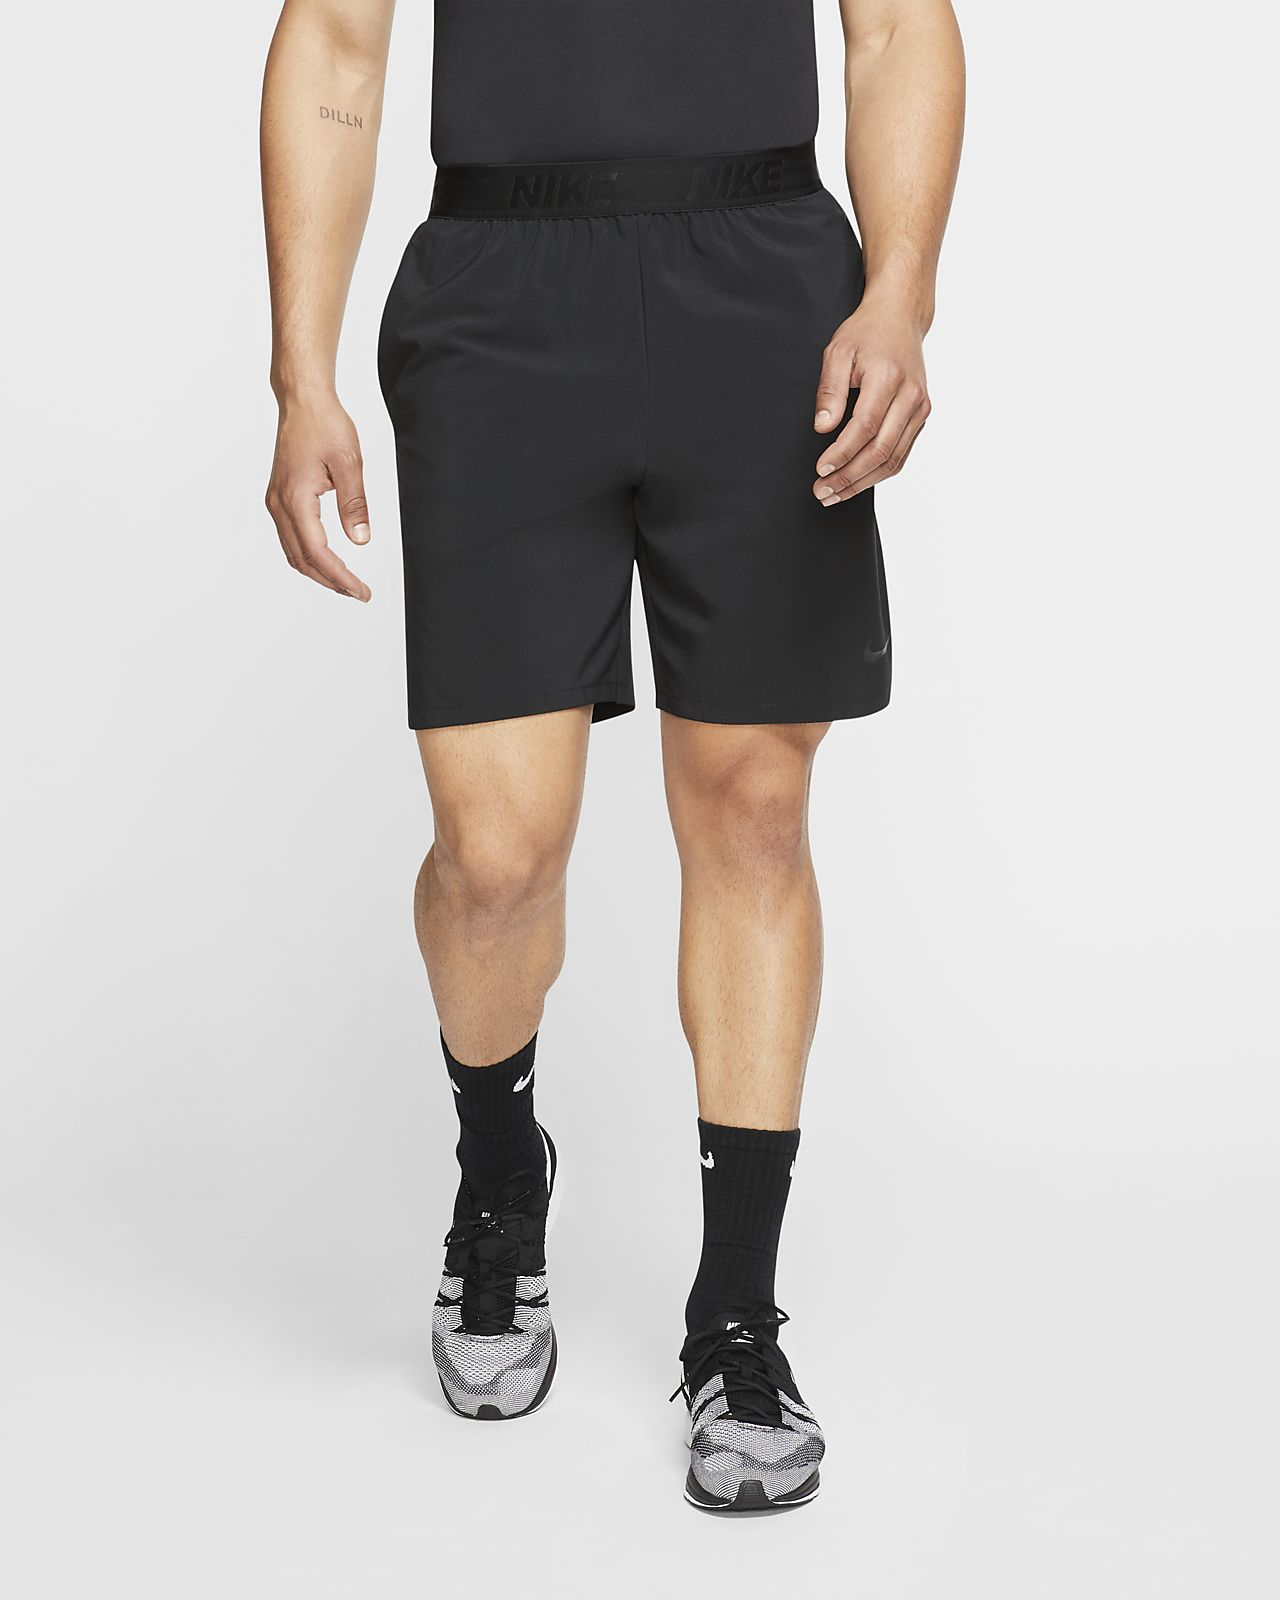 ... Nike Flex Herren-Trainingsshorts (ca. 20,5 cm)